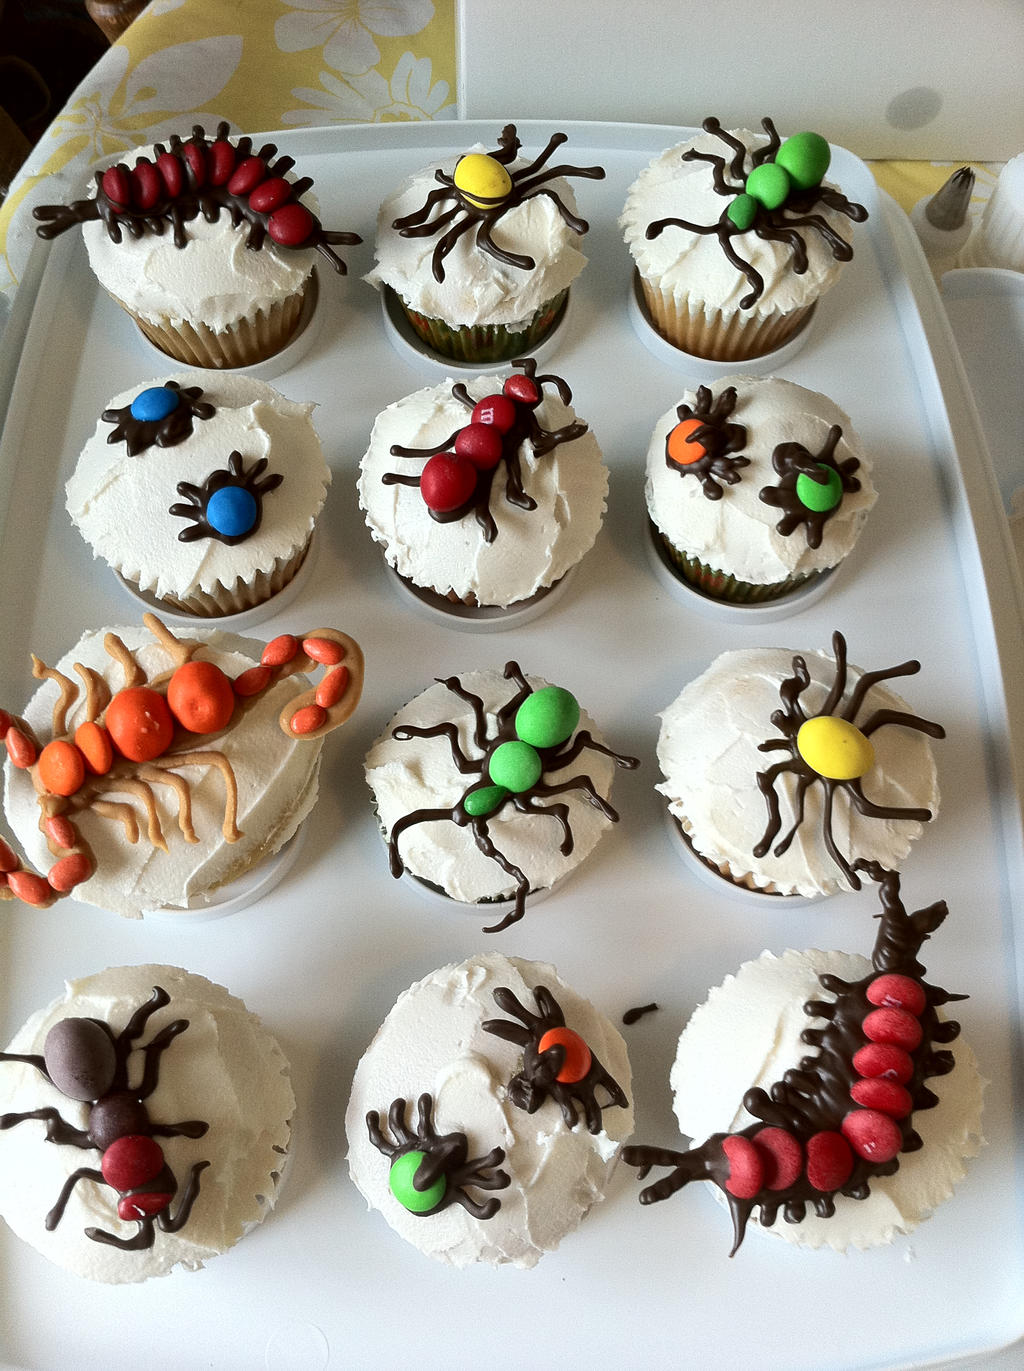 Bug Cupcakes By Starrosethree On DeviantArt - Bug cupcake decorating ideas